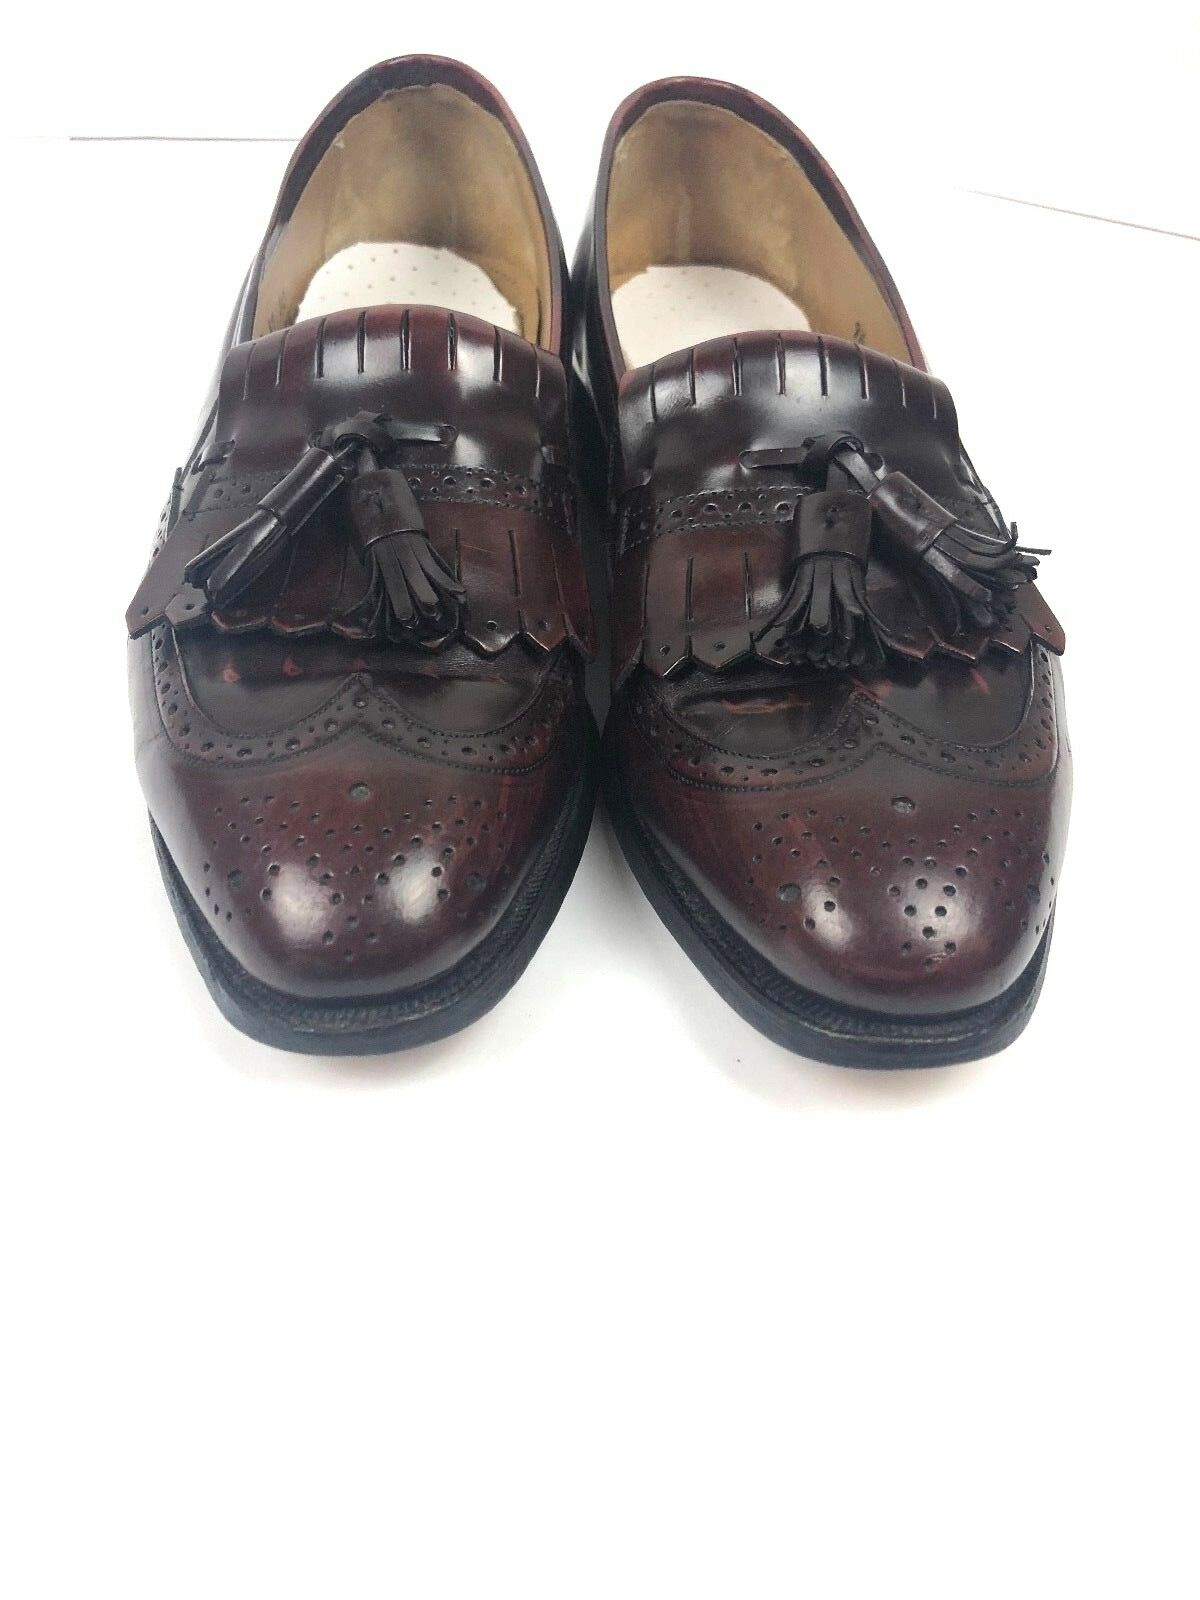 Men's Leather Slip On Loafers Johnston Murphy Size 9½ D B Tassle Leather Mens